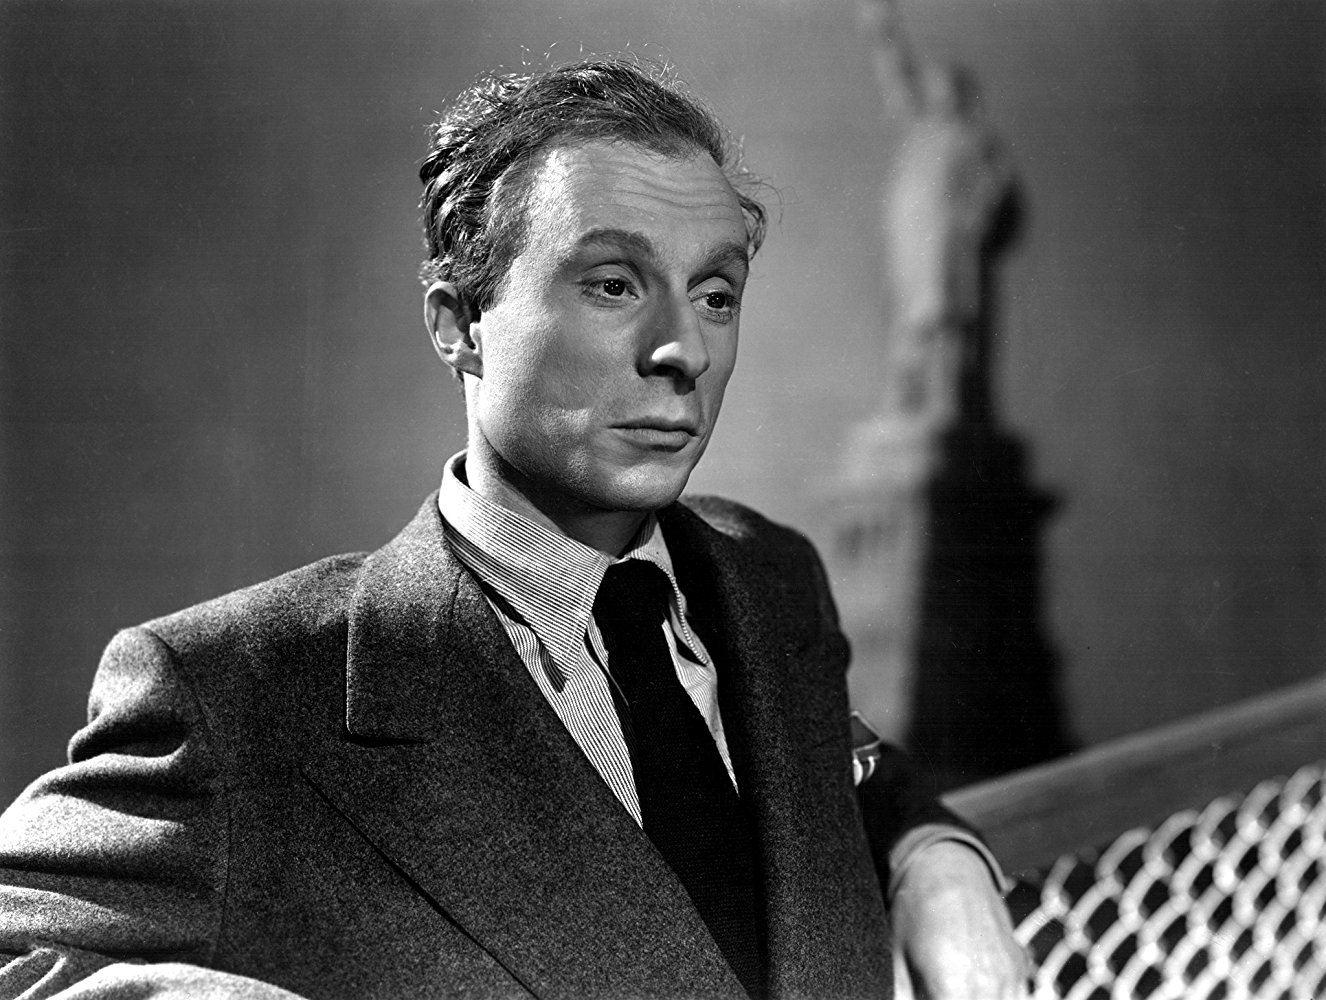 Norman Lloyd in Saboteur